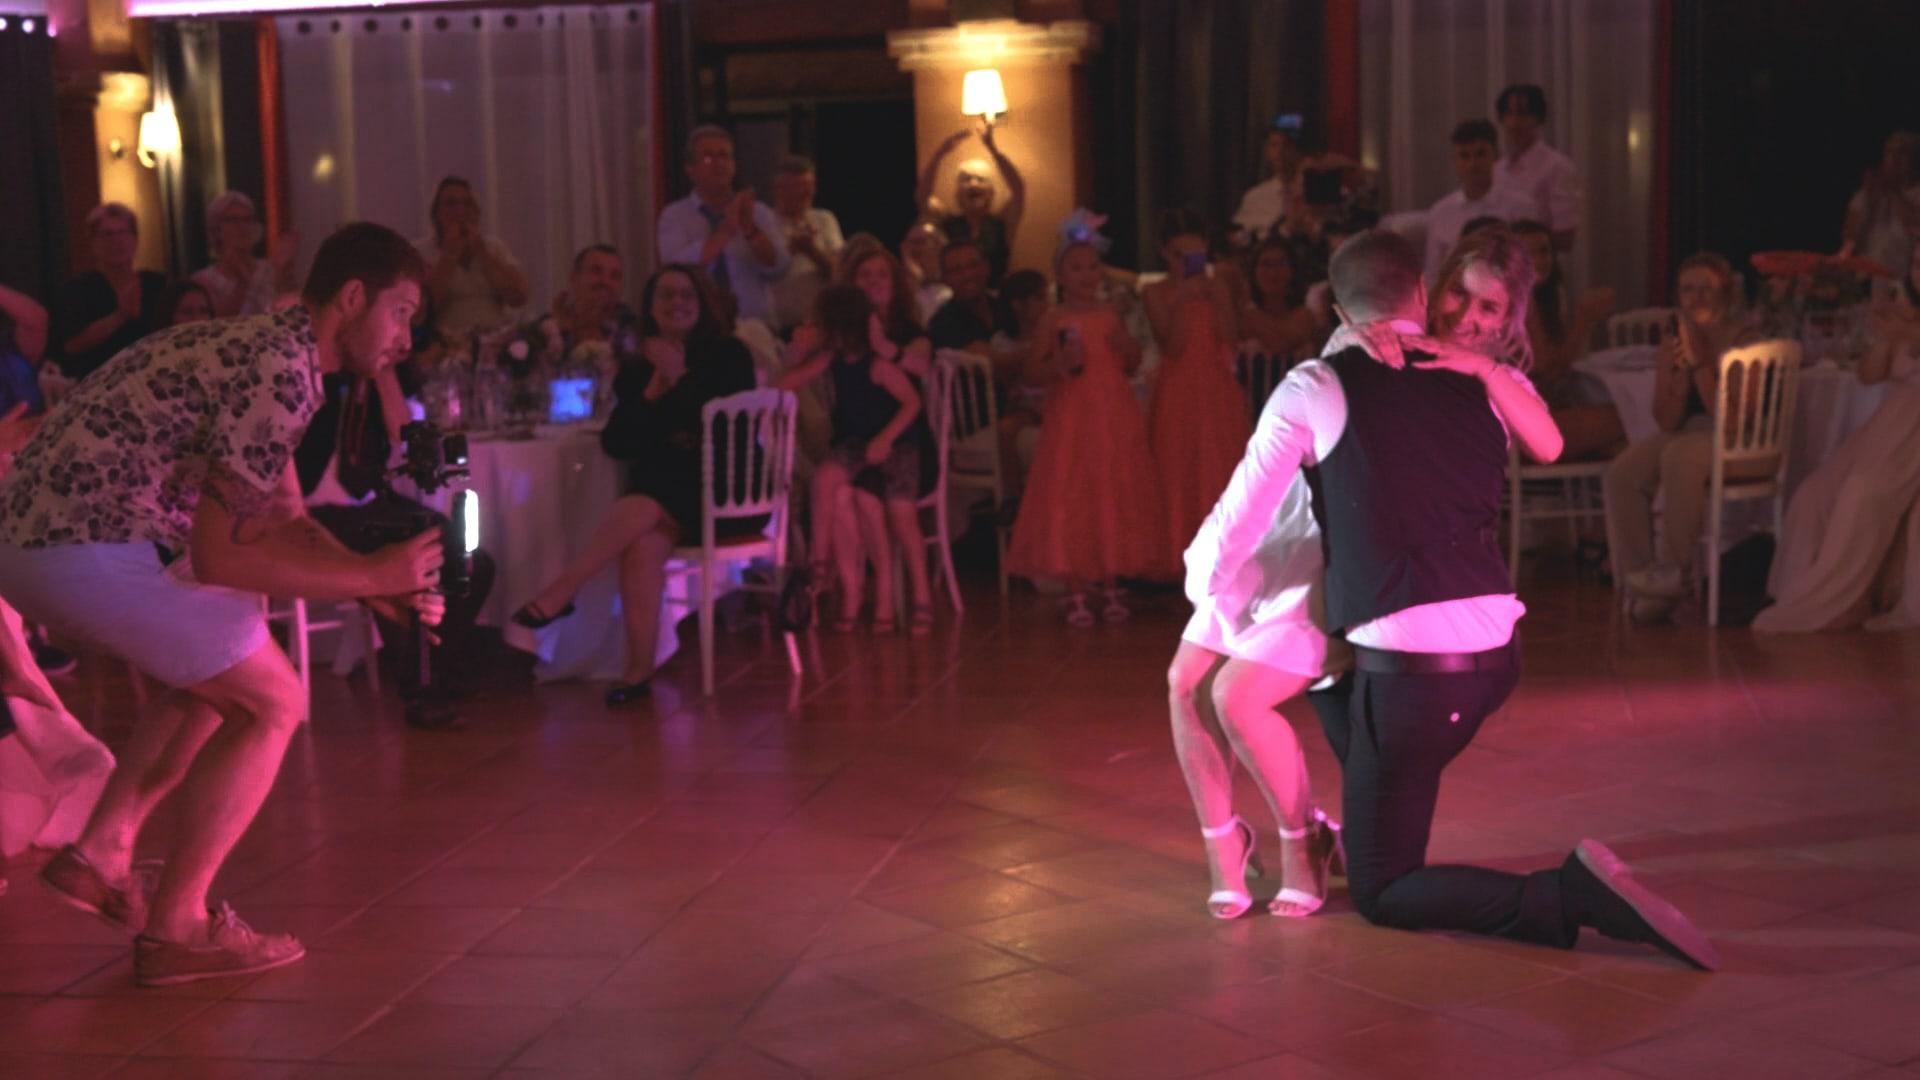 Vidéo de mariage et vidéaste